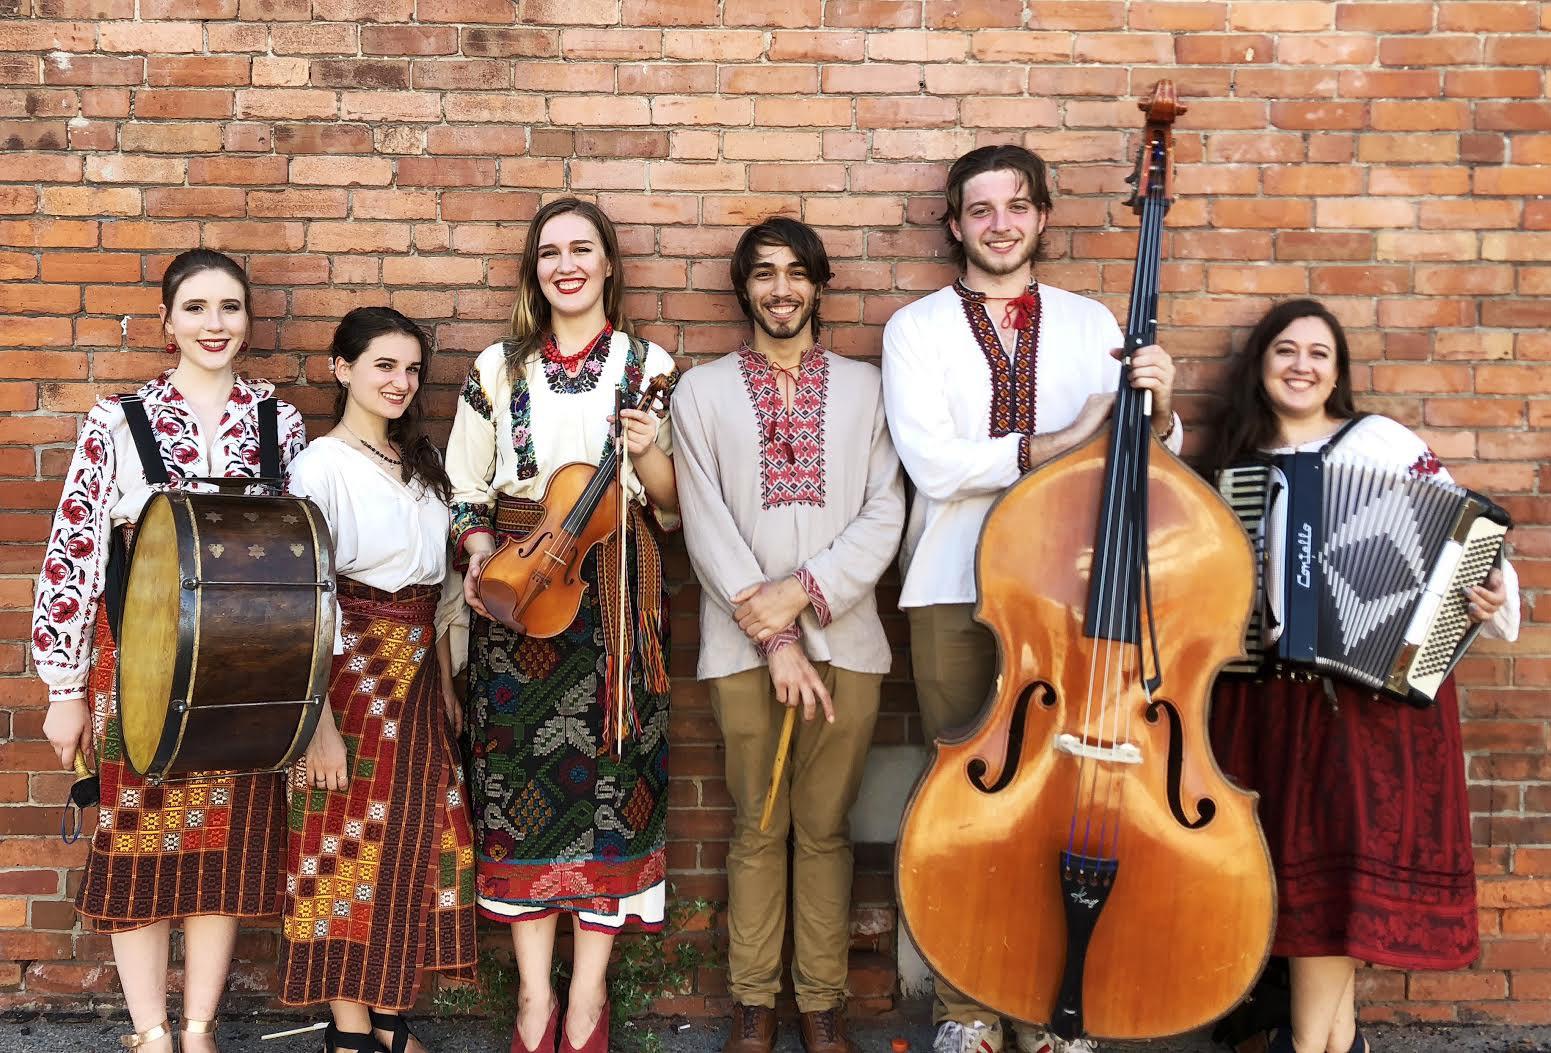 Korinya Ukrainian Folk Band